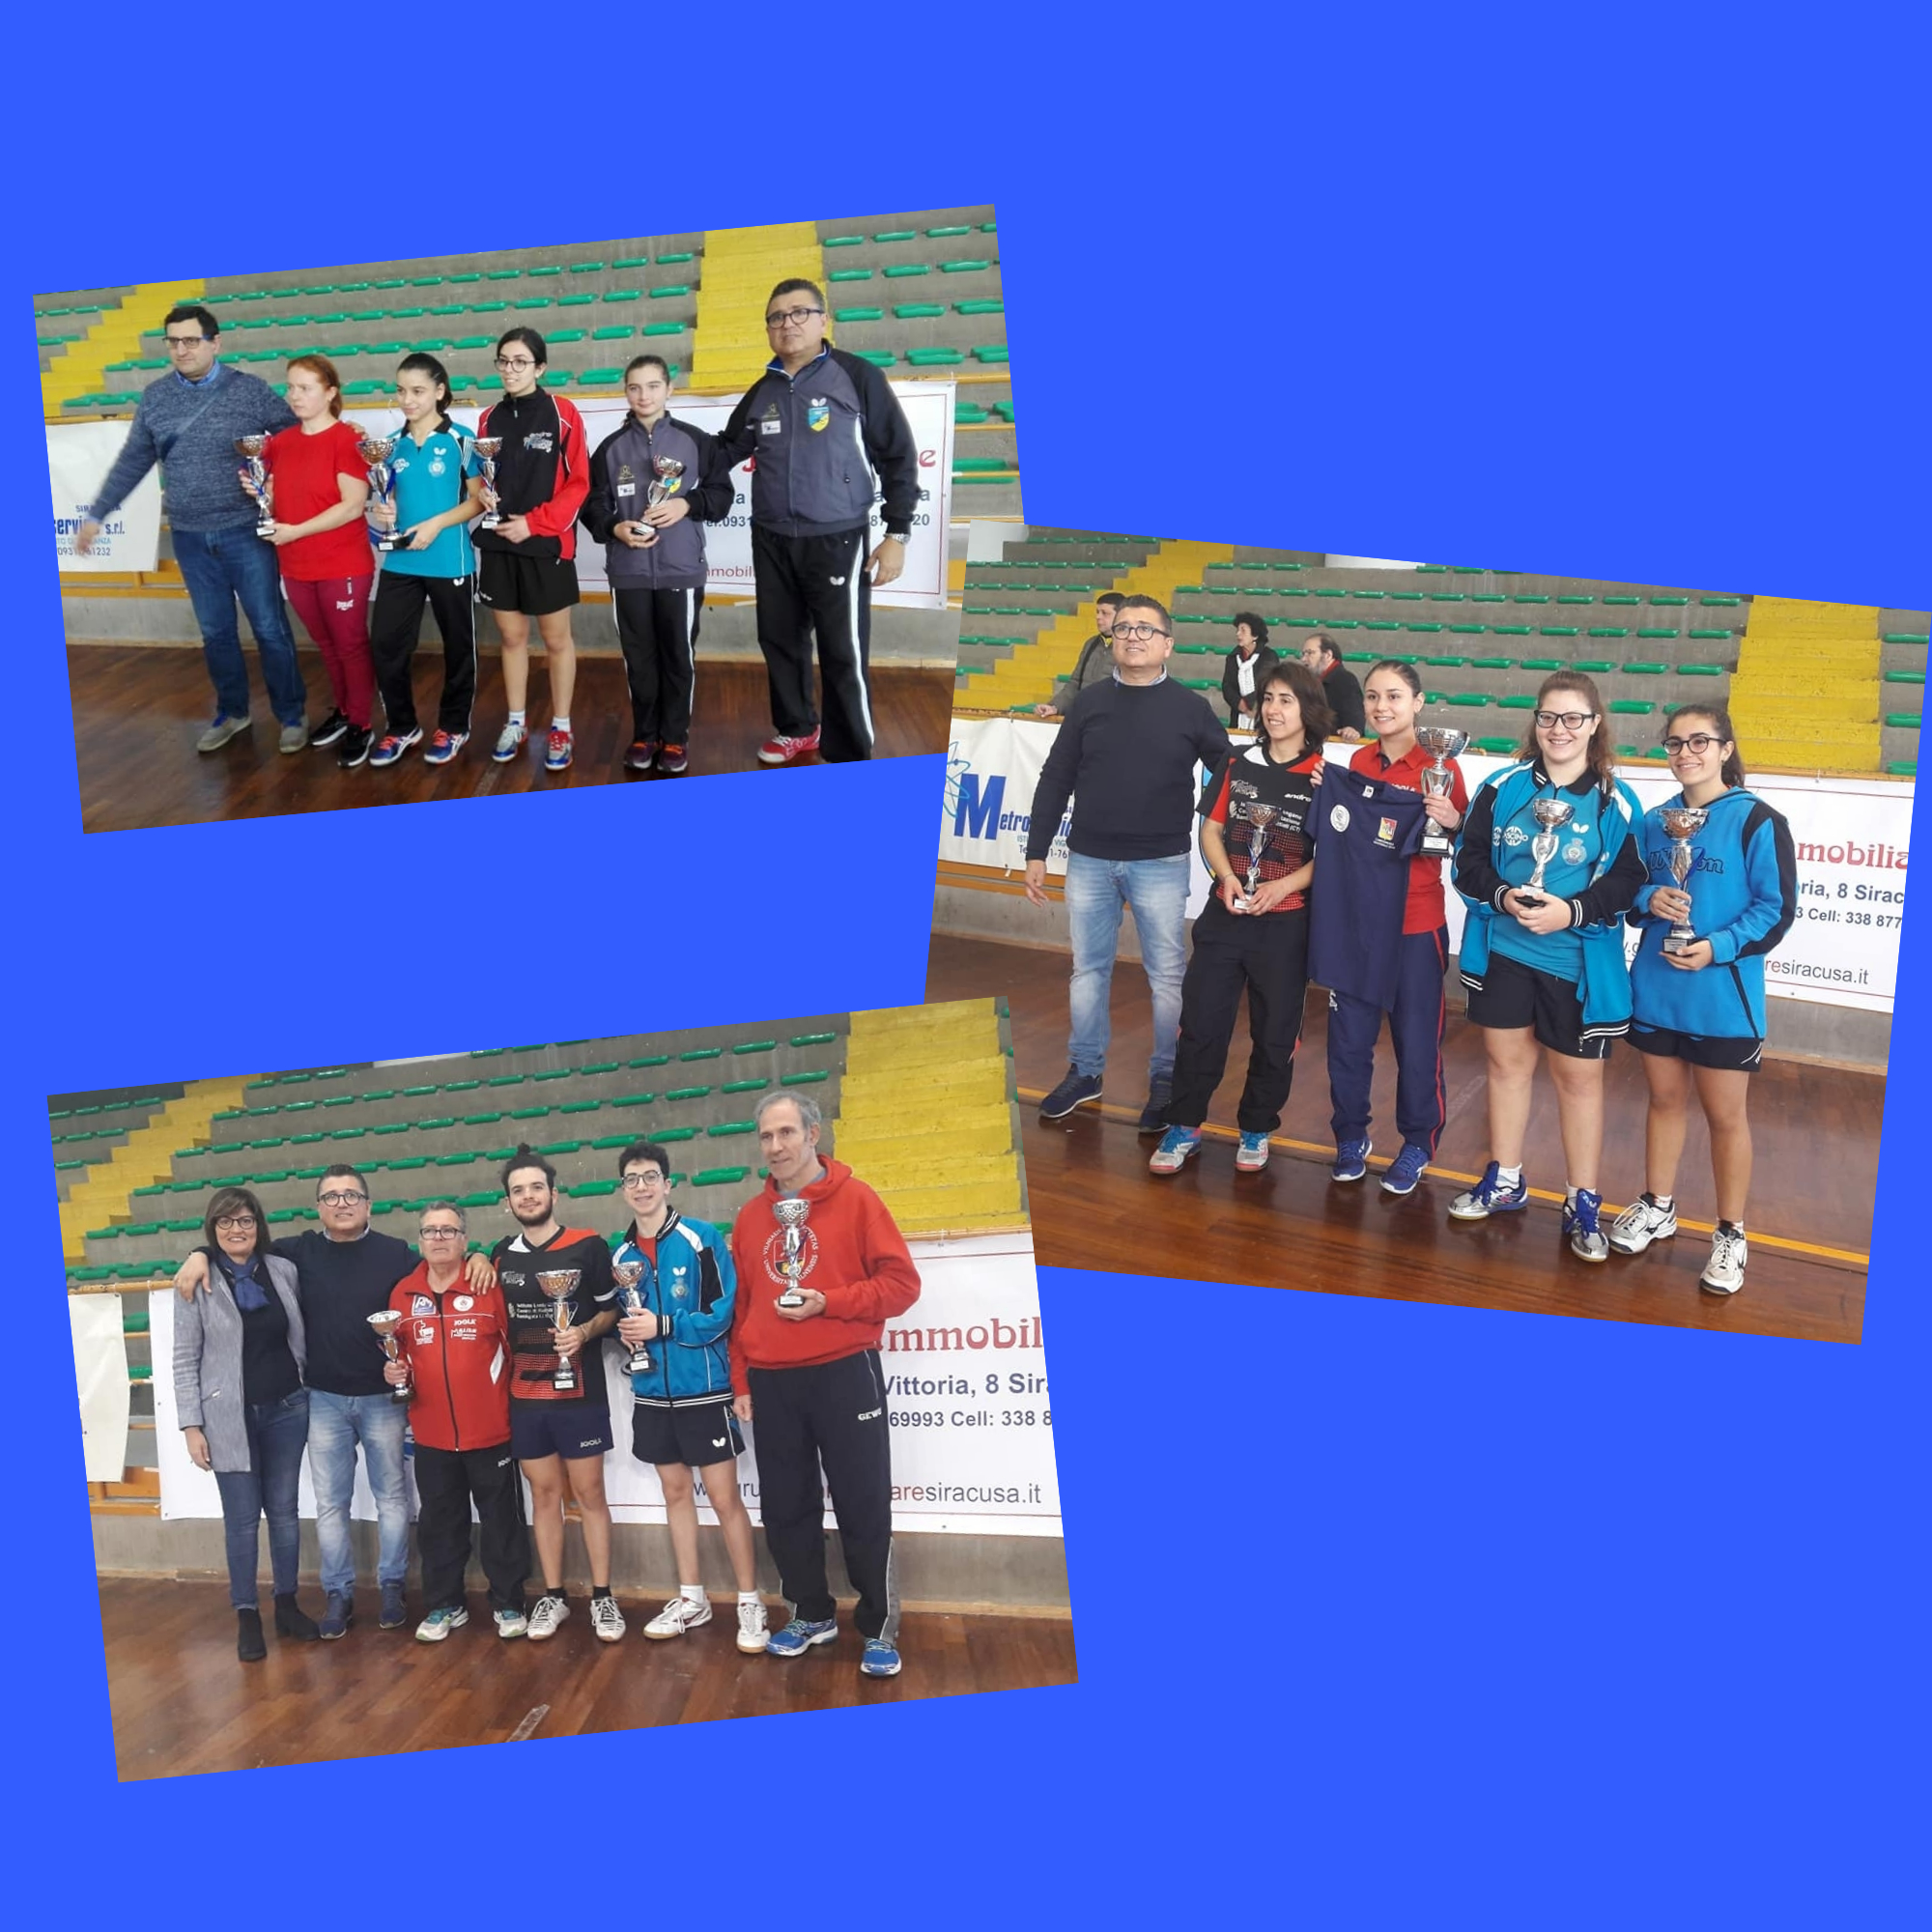 Campionati Regionali di Tennistavolo di Categoria 2018/2019